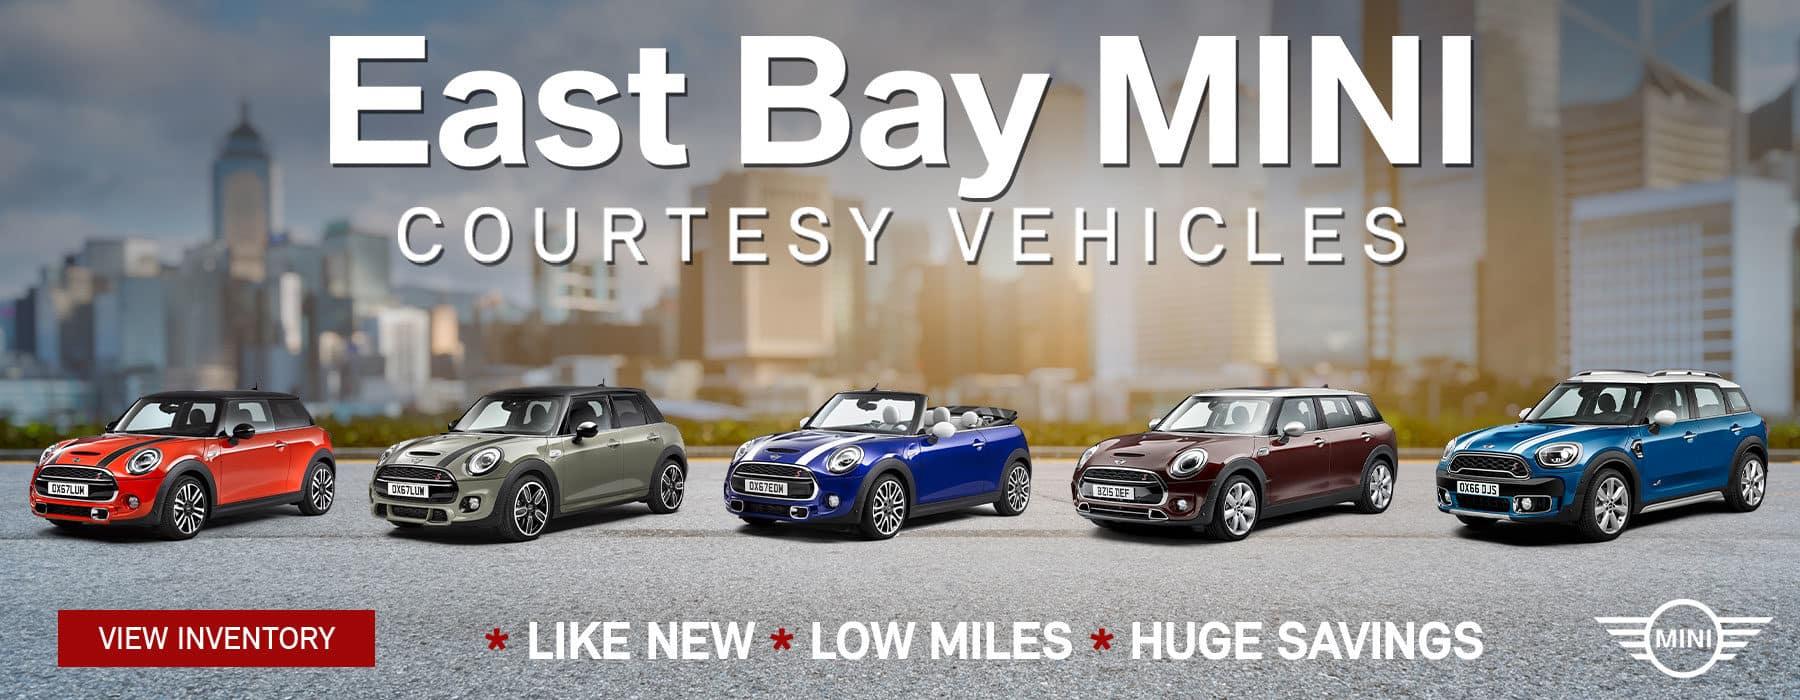 East Bay Mini >> East Bay Mini Mini Dealer In Pleasanton Ca